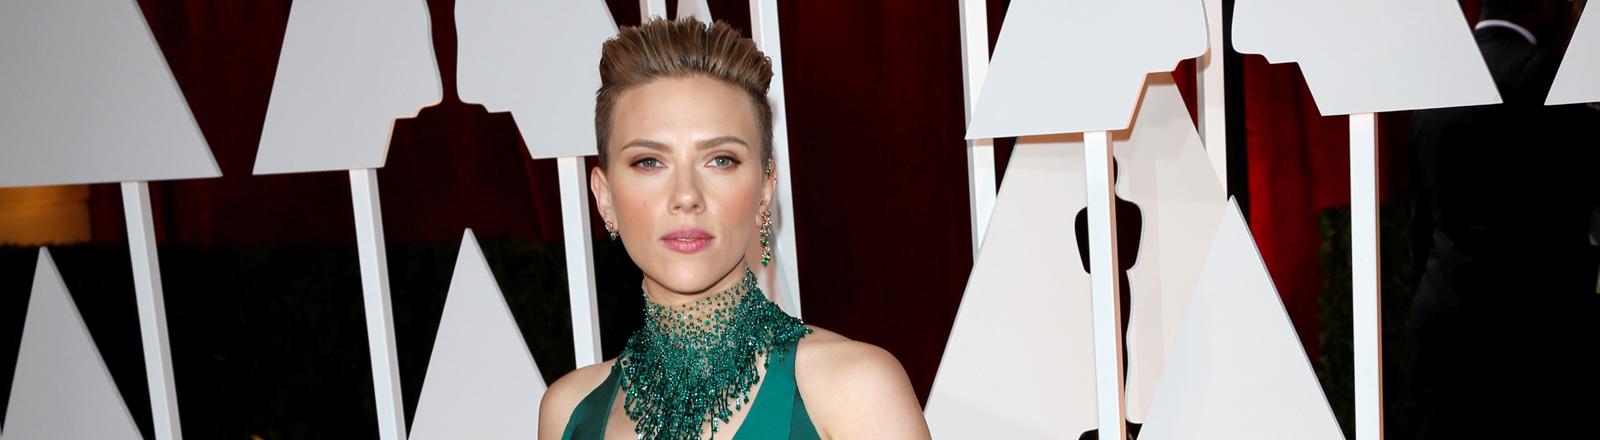 Scarlett Johansson bei der Oscar-Verleihung am 22. Februar 2015